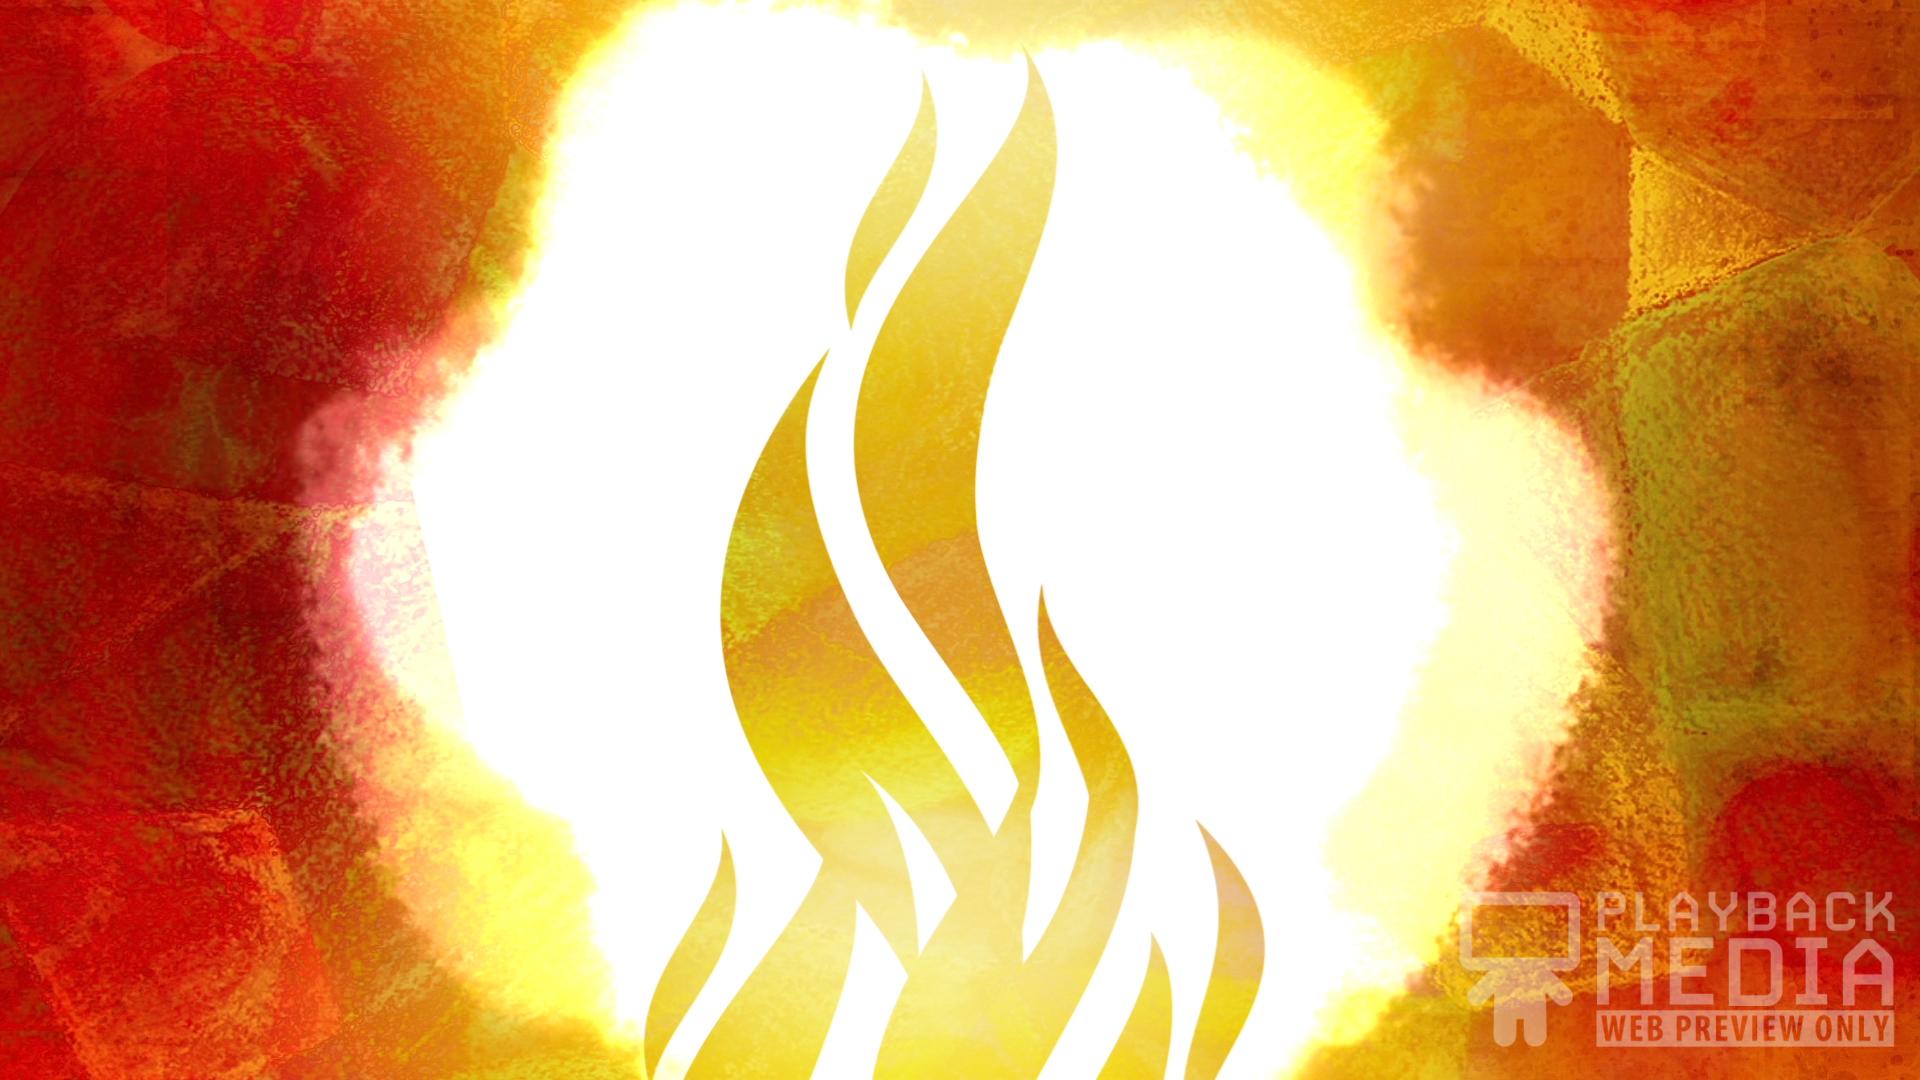 Flames of Grace 2 Motion Image